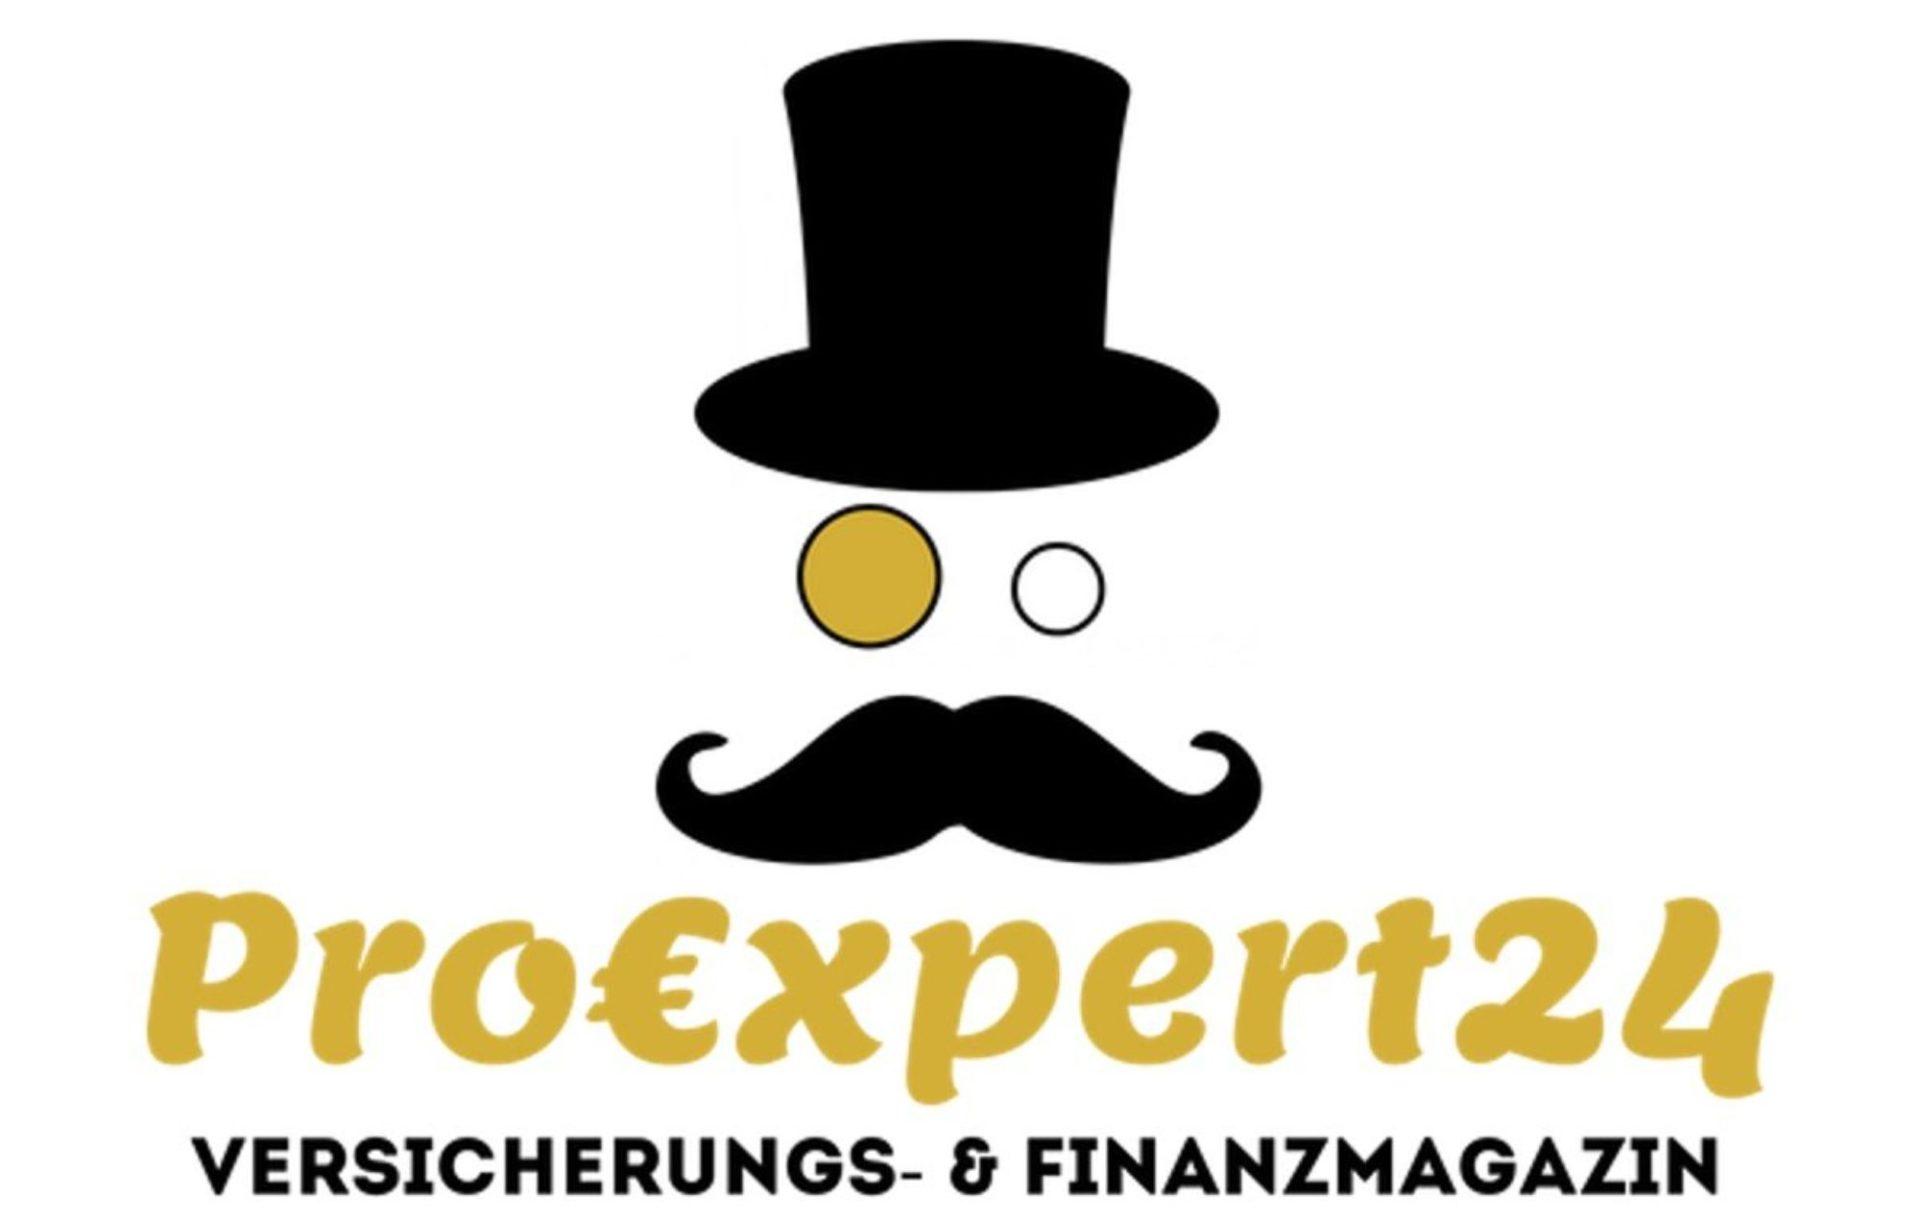 cropped cropped proexpert24 expertenmagazin logo 1